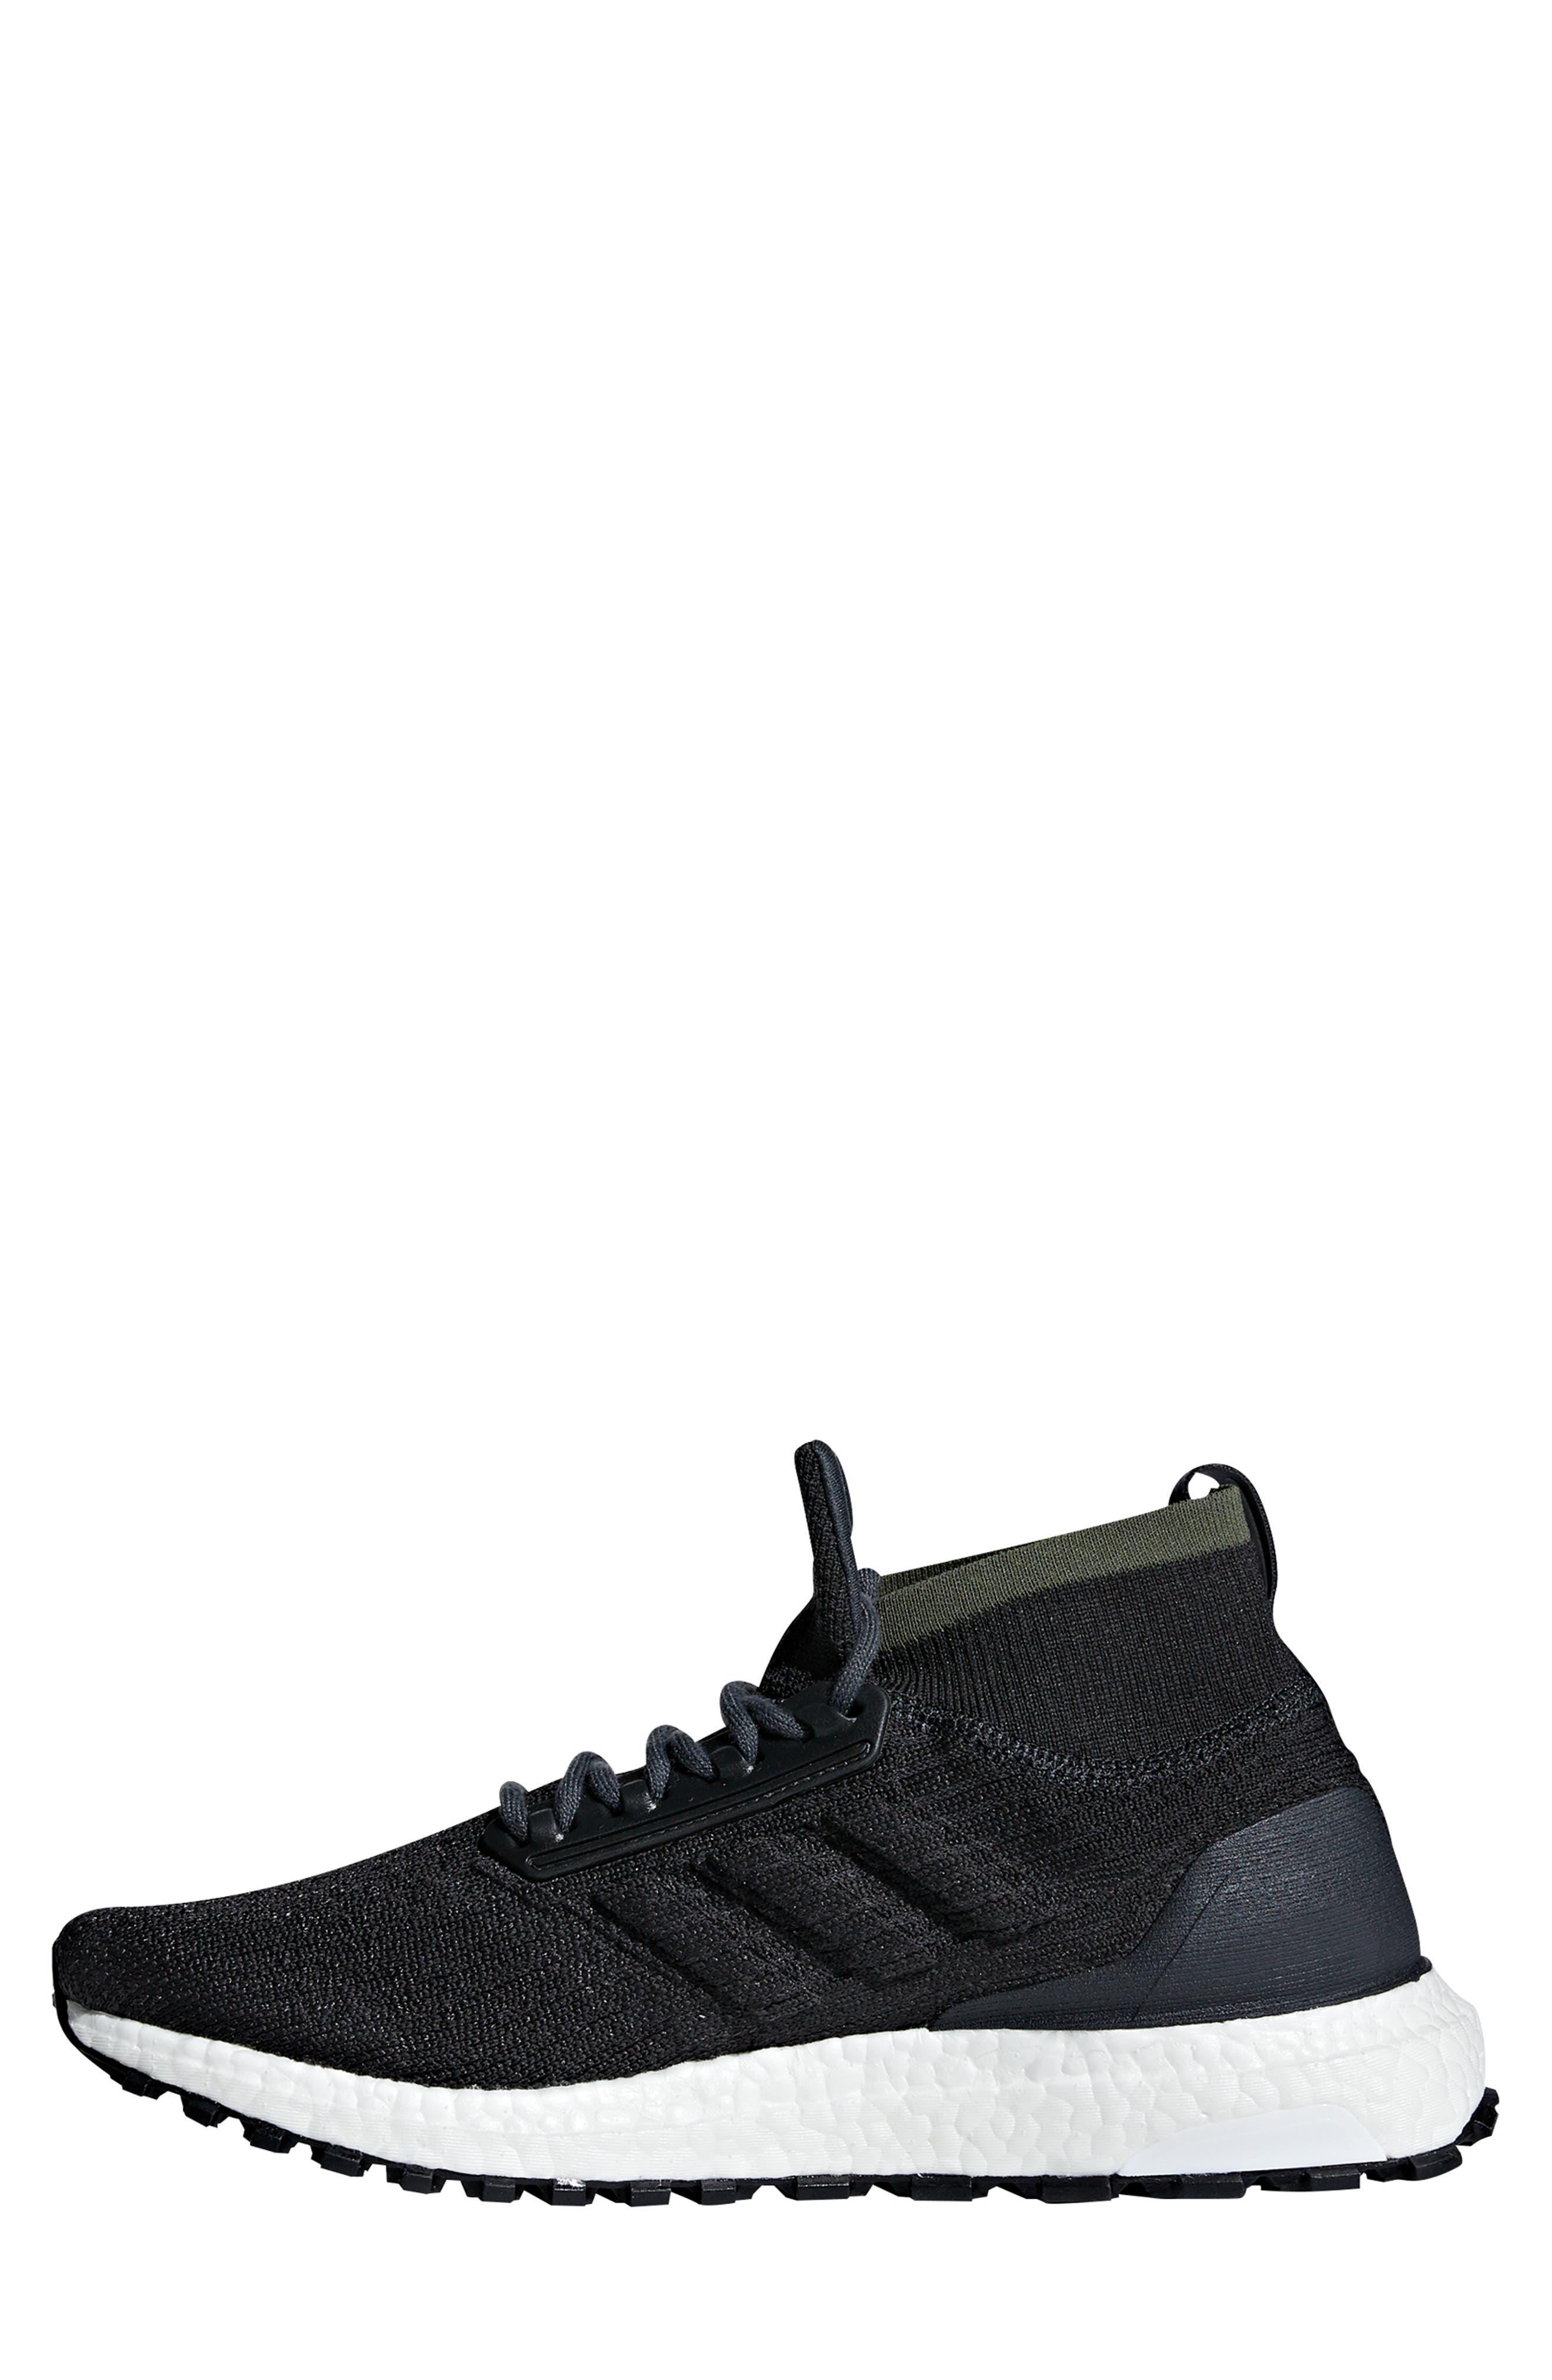 UltraBoost All Terrain Water Resistant Running Shoe,                             Alternate thumbnail 8, color,                             CARBON / CORE BLACK / WHITE